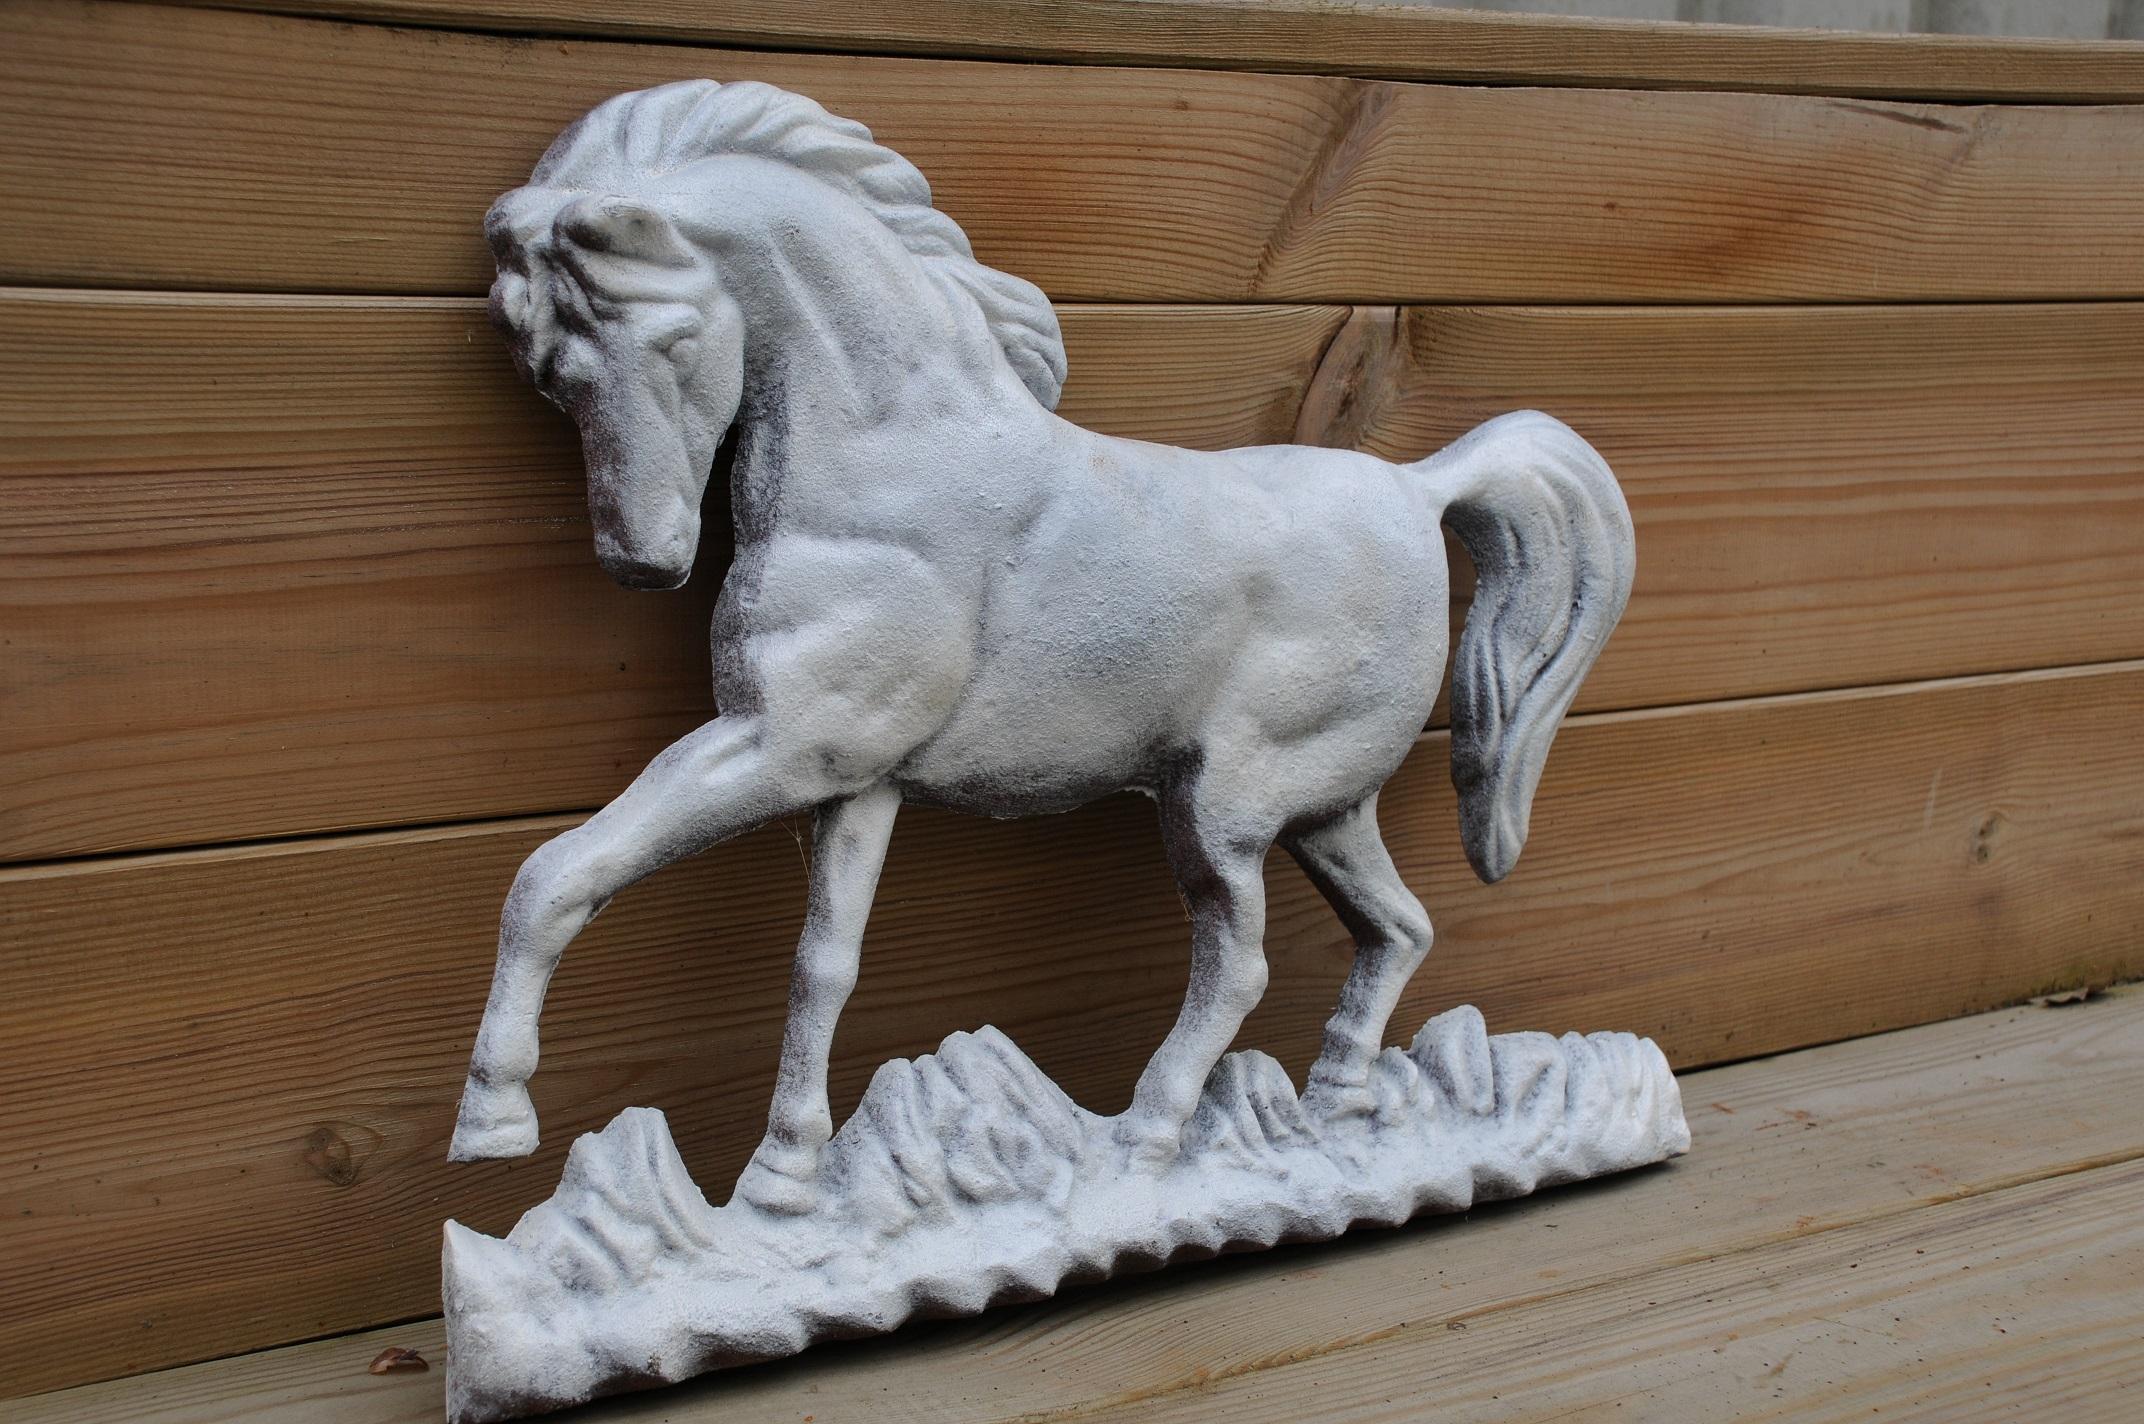 Tags decoratie antiek ijzer tuinmuur deuropening paard